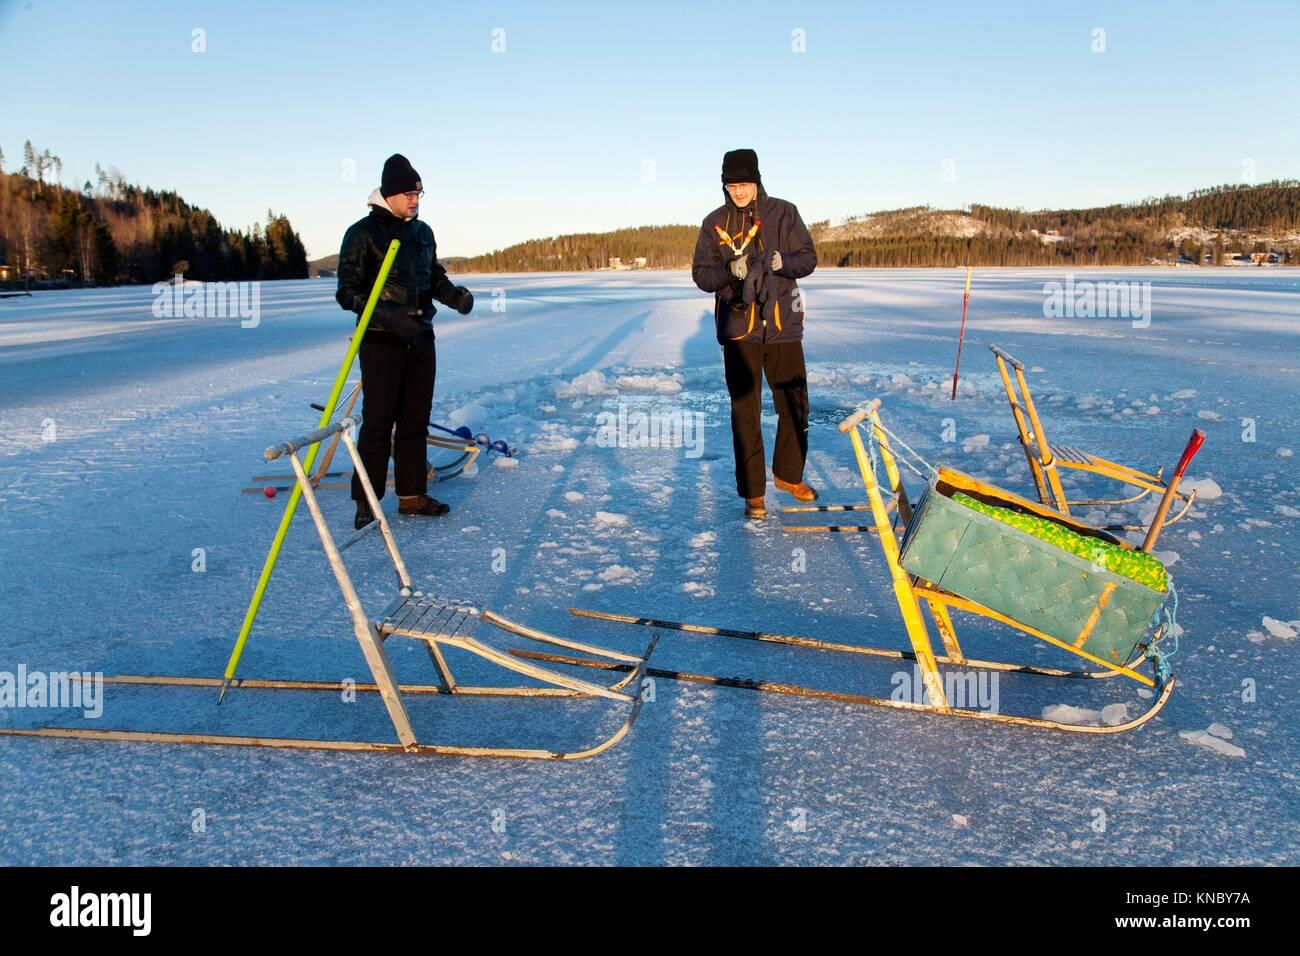 Brothers kicksledding Northern Sweden. - Stock Image